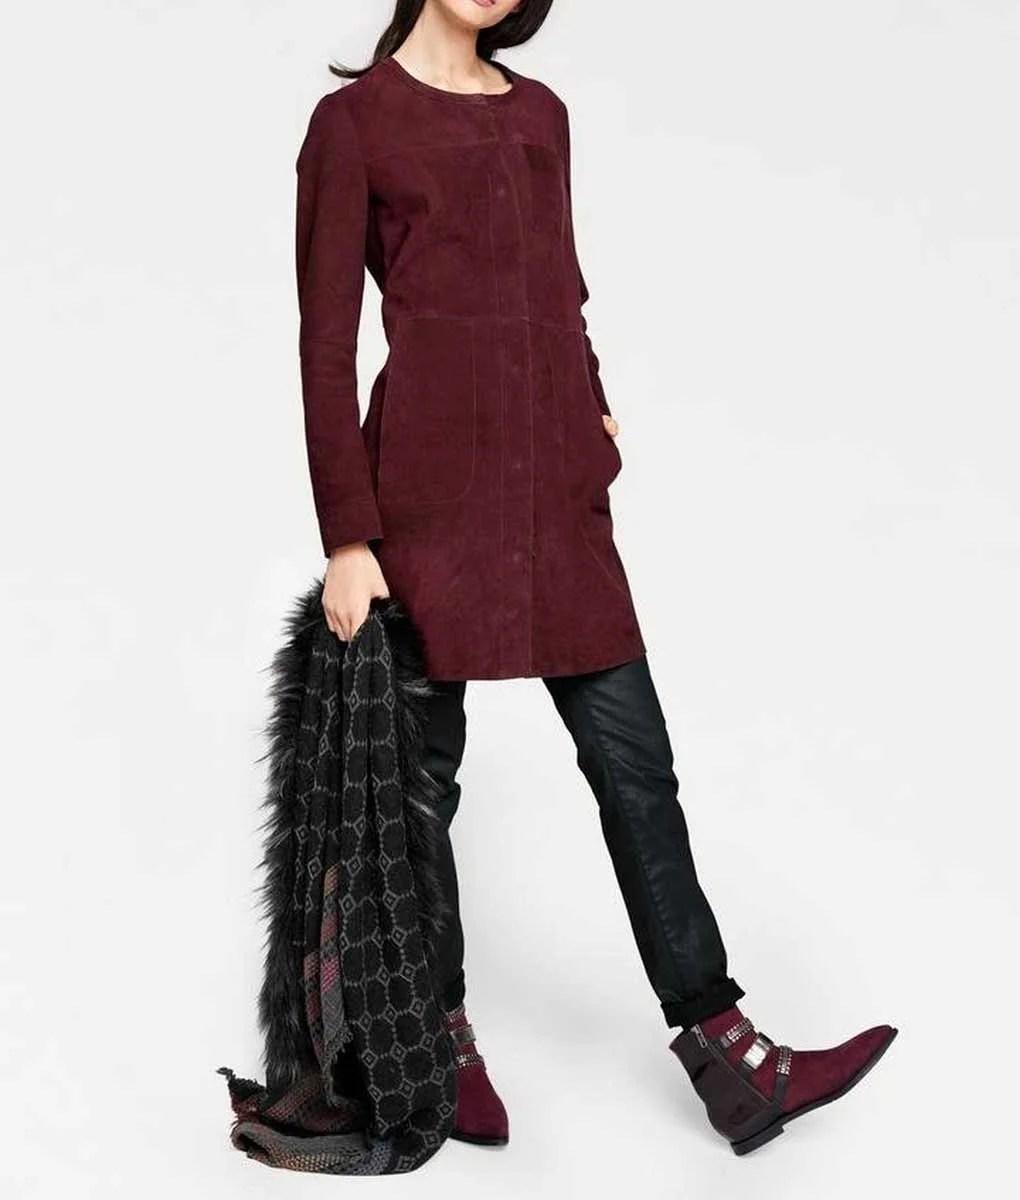 038.114 Rick Cardona Damen Designer-Ledermantel Ziegenvelours Dunkelrot Bordeaux